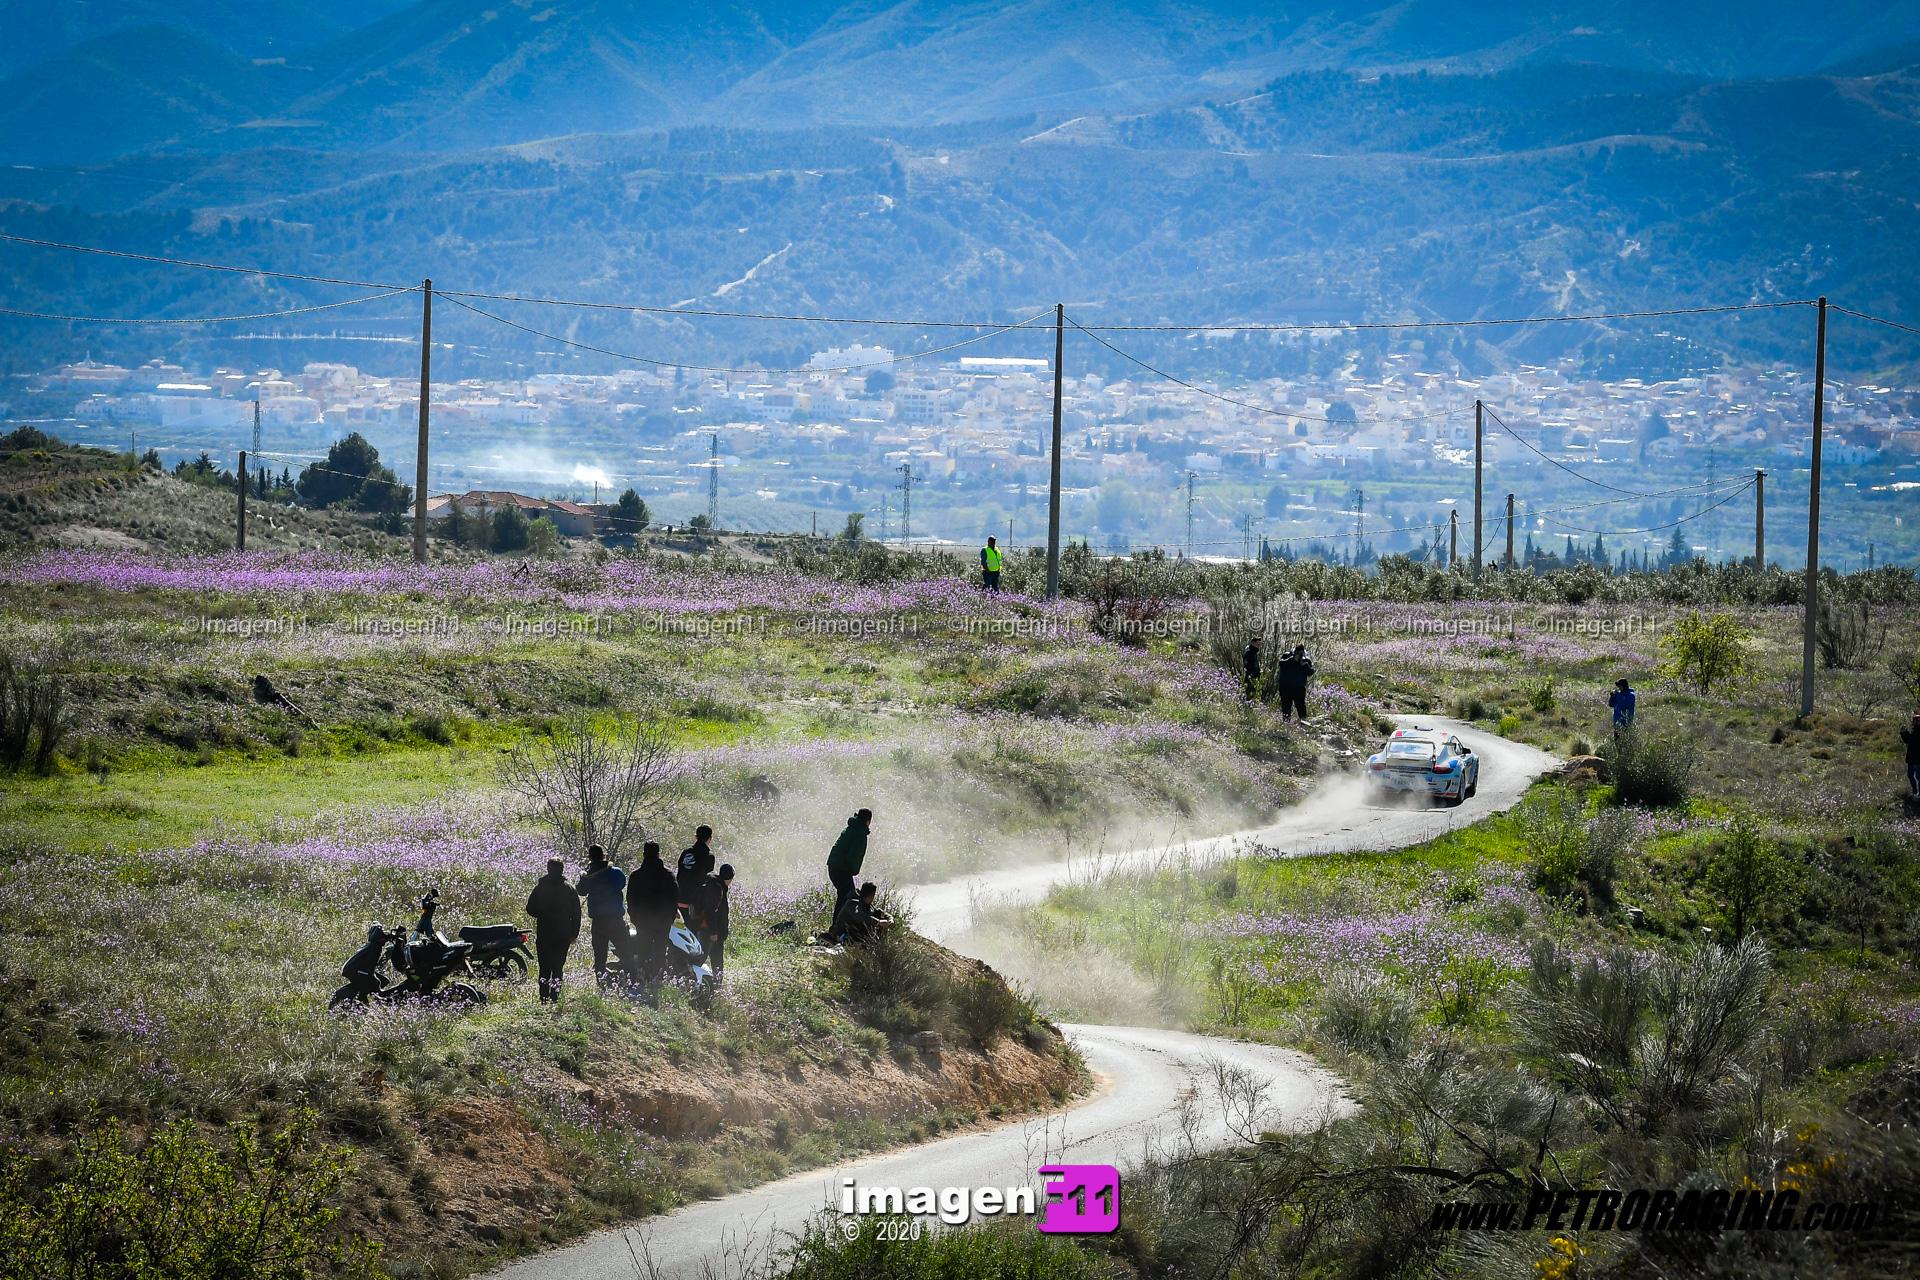 Jose Antonio Aznar, Rallye Valle del Almanzora, campeonato de andalucía de rallye